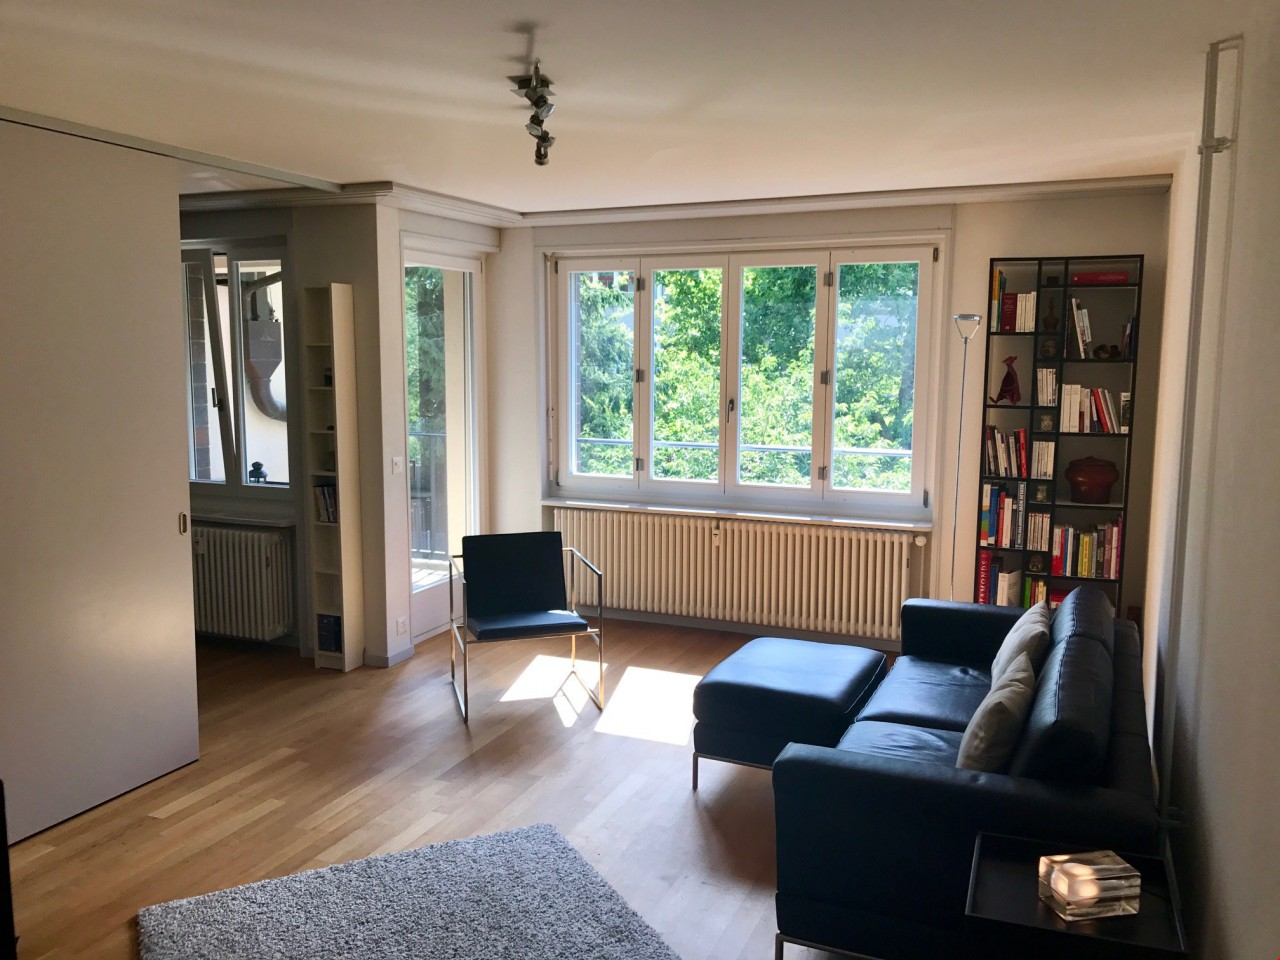 Moderne 2.5 Zimmer Wohnung im Kirchenfeld-Quartier - ImmoScout24